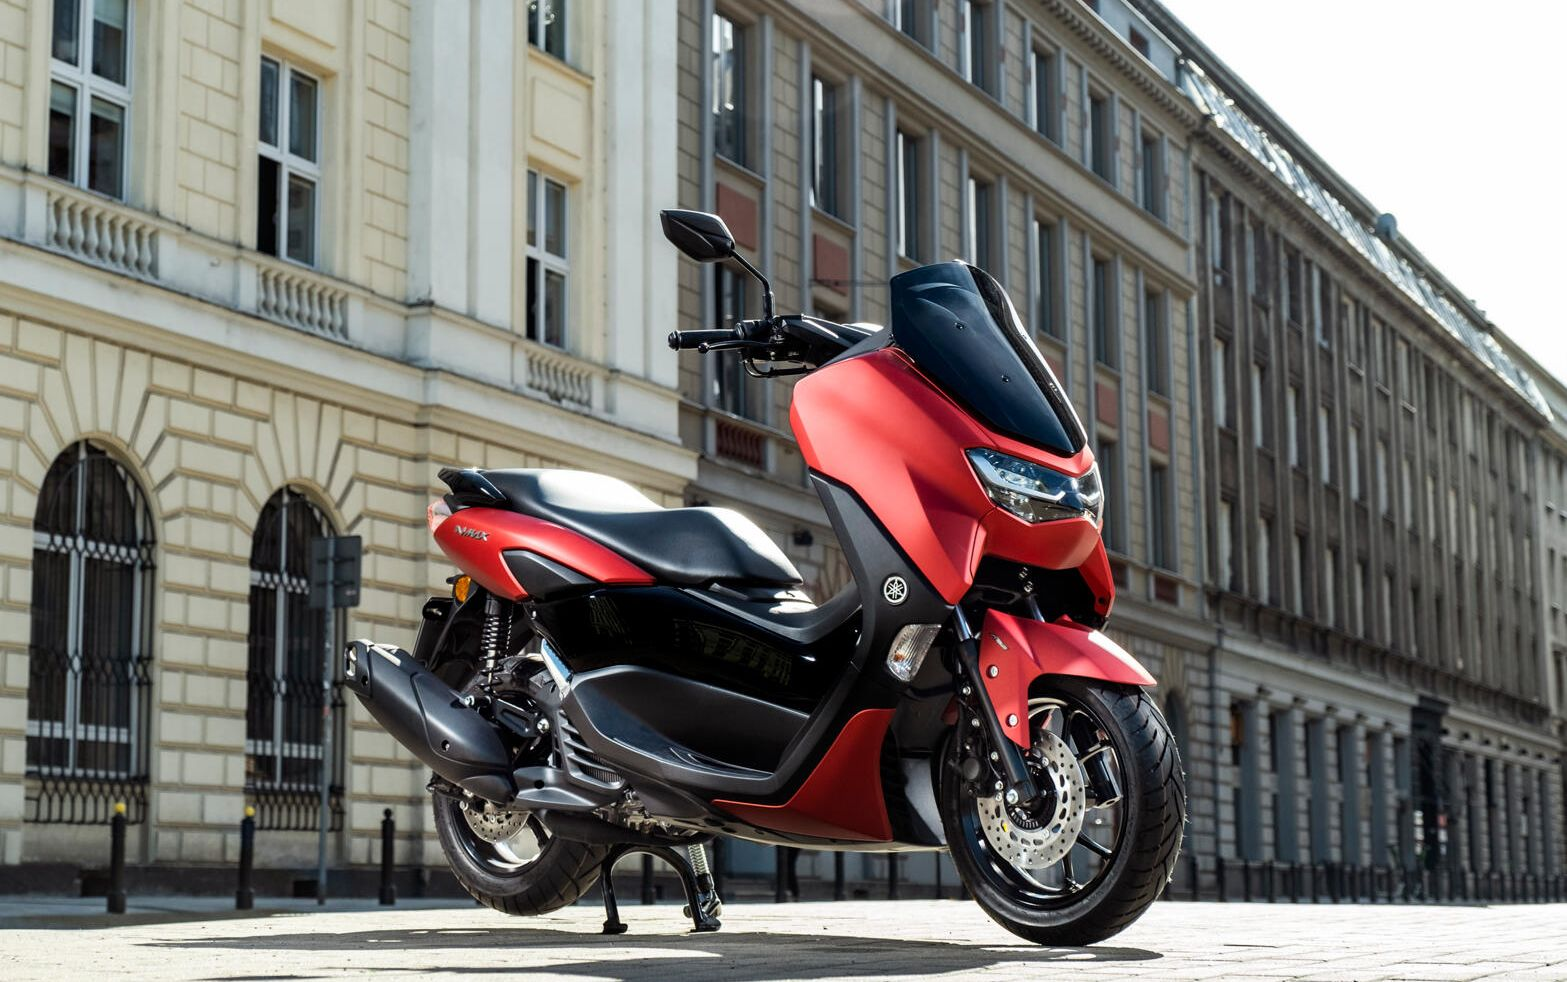 tnol.co.id- sobat bro sekalian pasti sudah tidak asing lagi dengan roda dua yang satu ini,Yamaha Nmax.Jika di indonesia Yamaha Nmax ini hanya di jual dengan 1 pilihan mesin saja,sementara di negara lain motor ini menyajikan 2 tipe mesin yaitu 125cc dan 155cc.